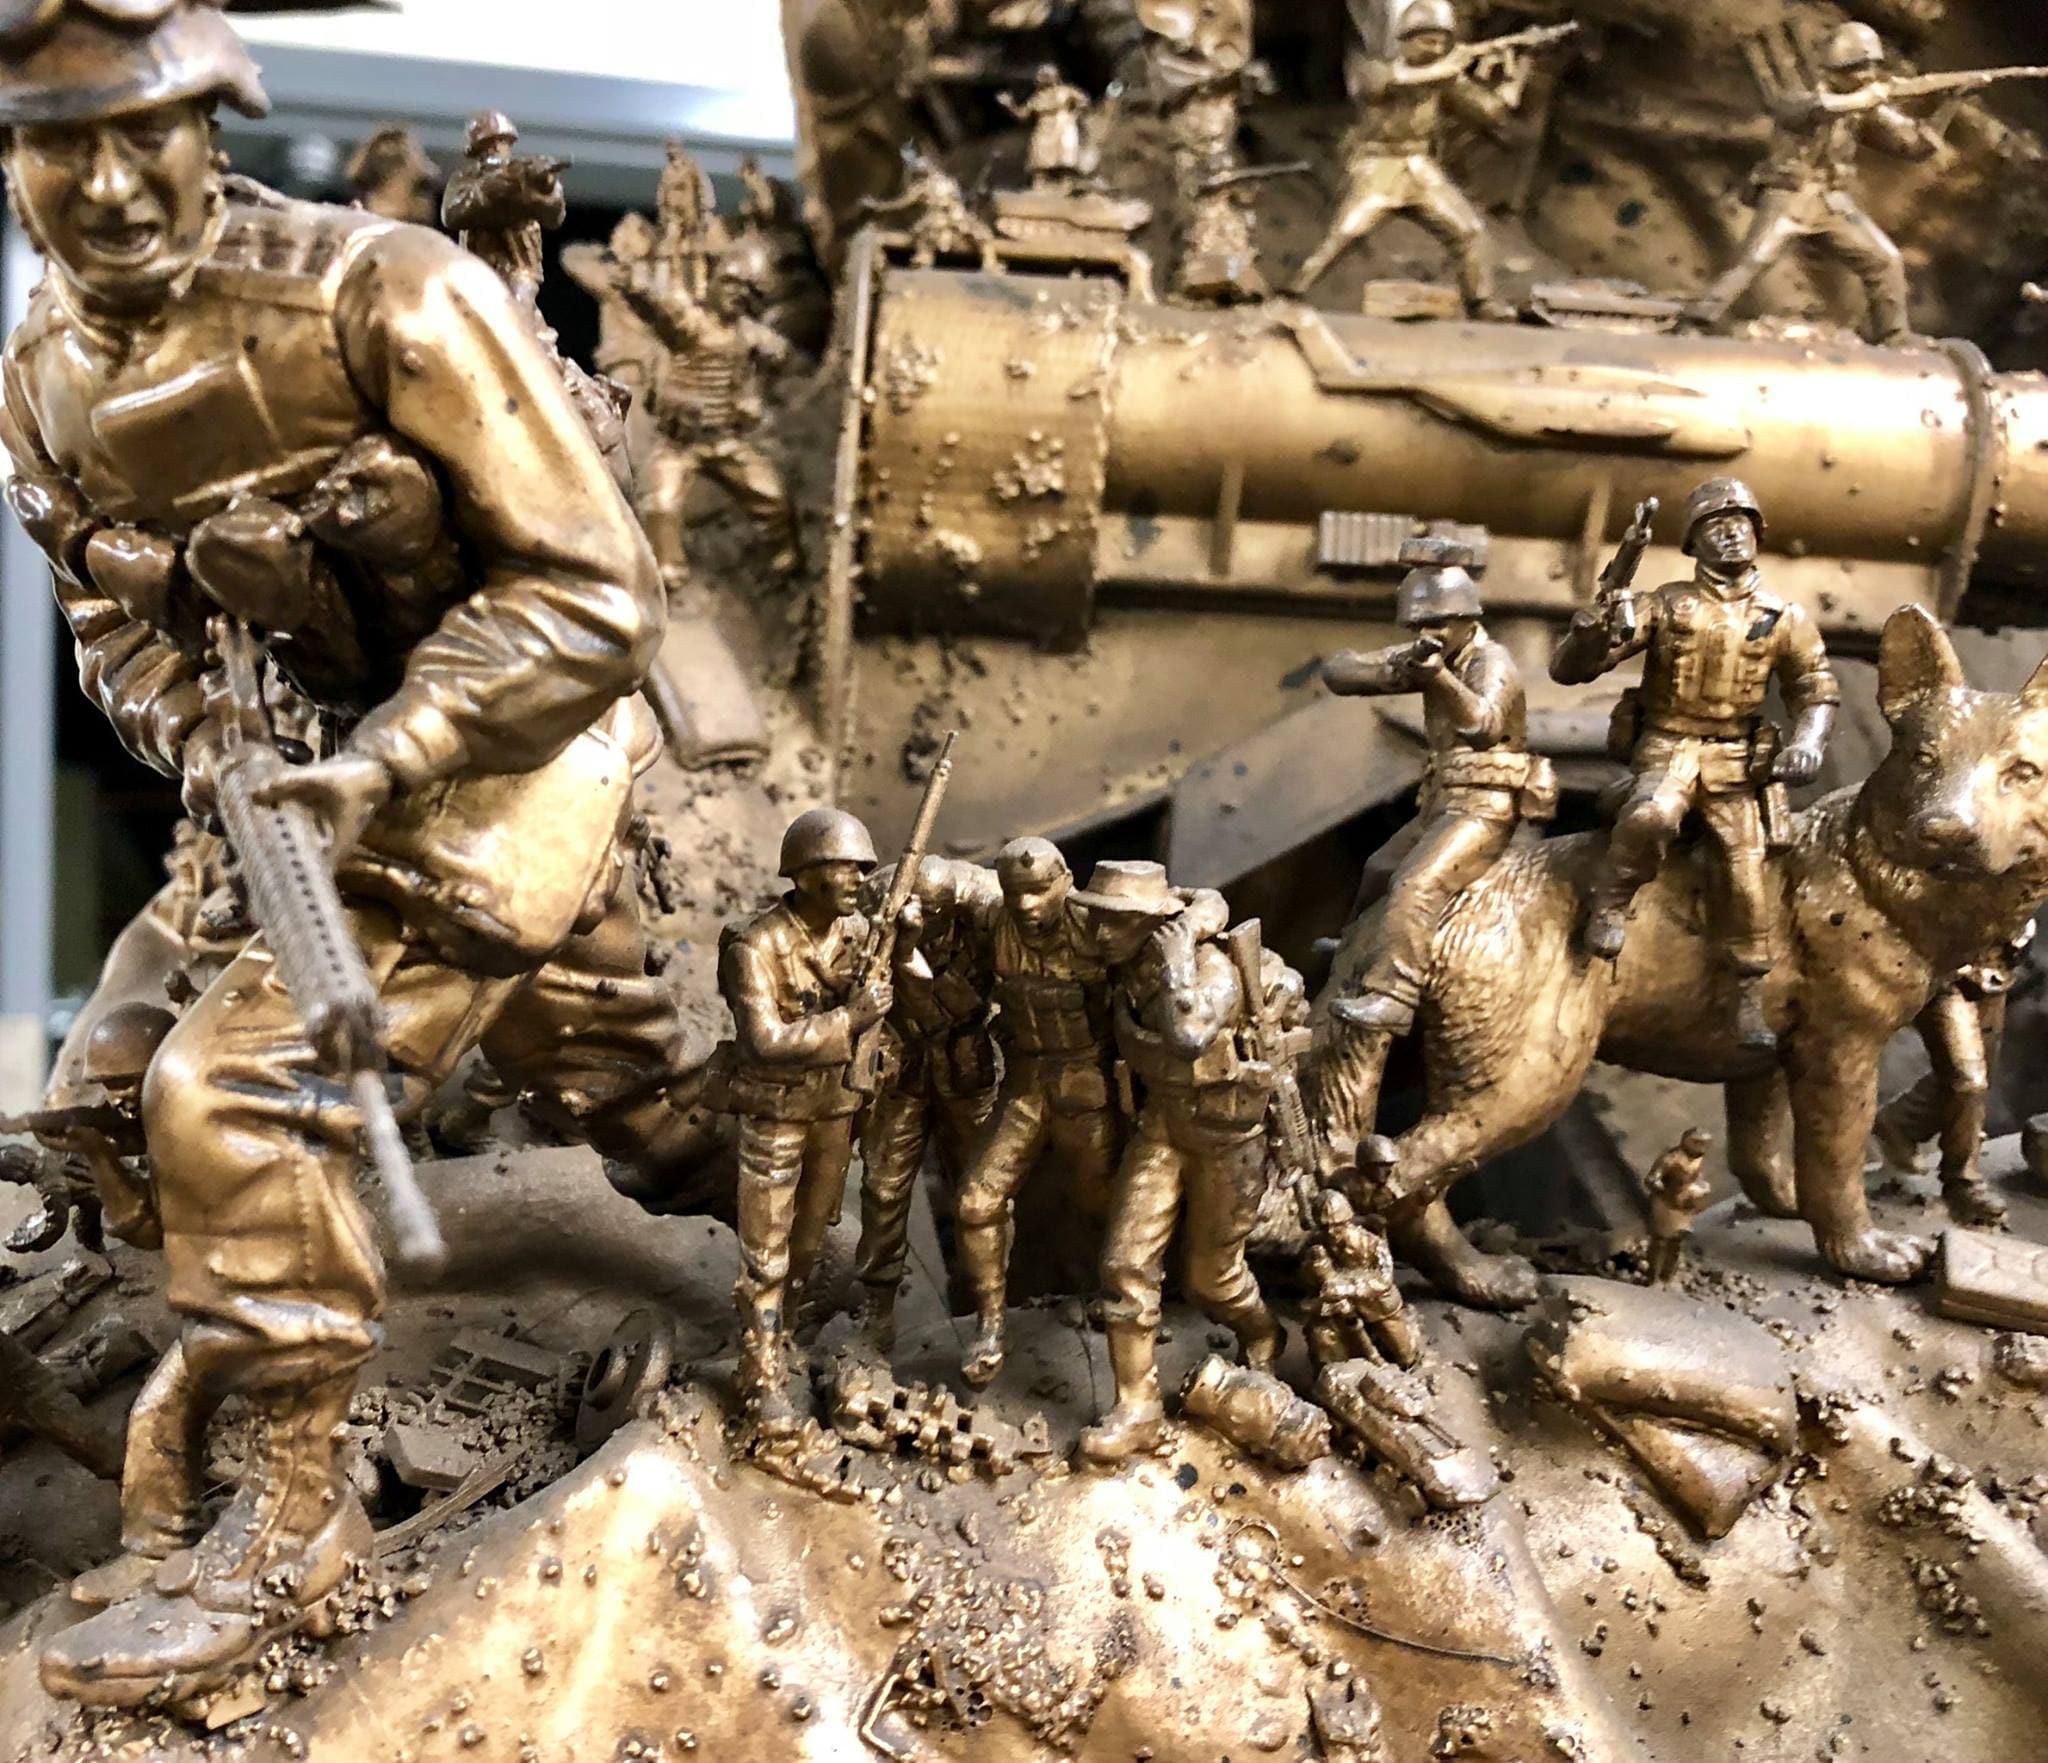 Marine Corps Museum puts intricate 'Battles Won' sculptures on display (PHOTOS) 3